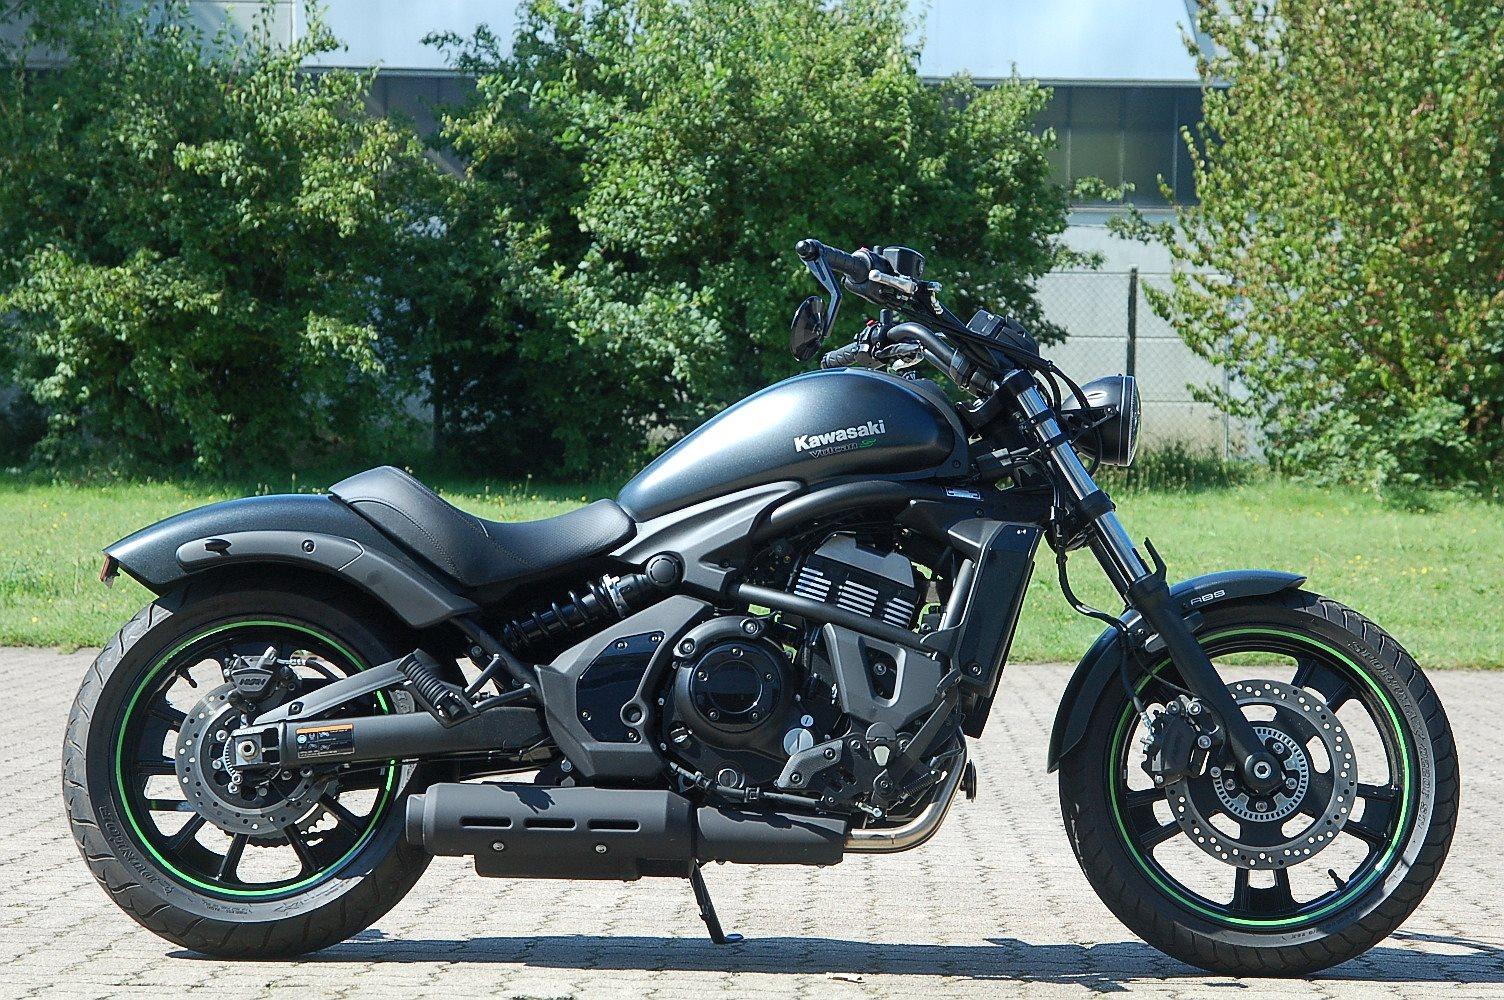 Details Zum Custom Bike Kawasaki Vulcan S Des Händlers Moto Service